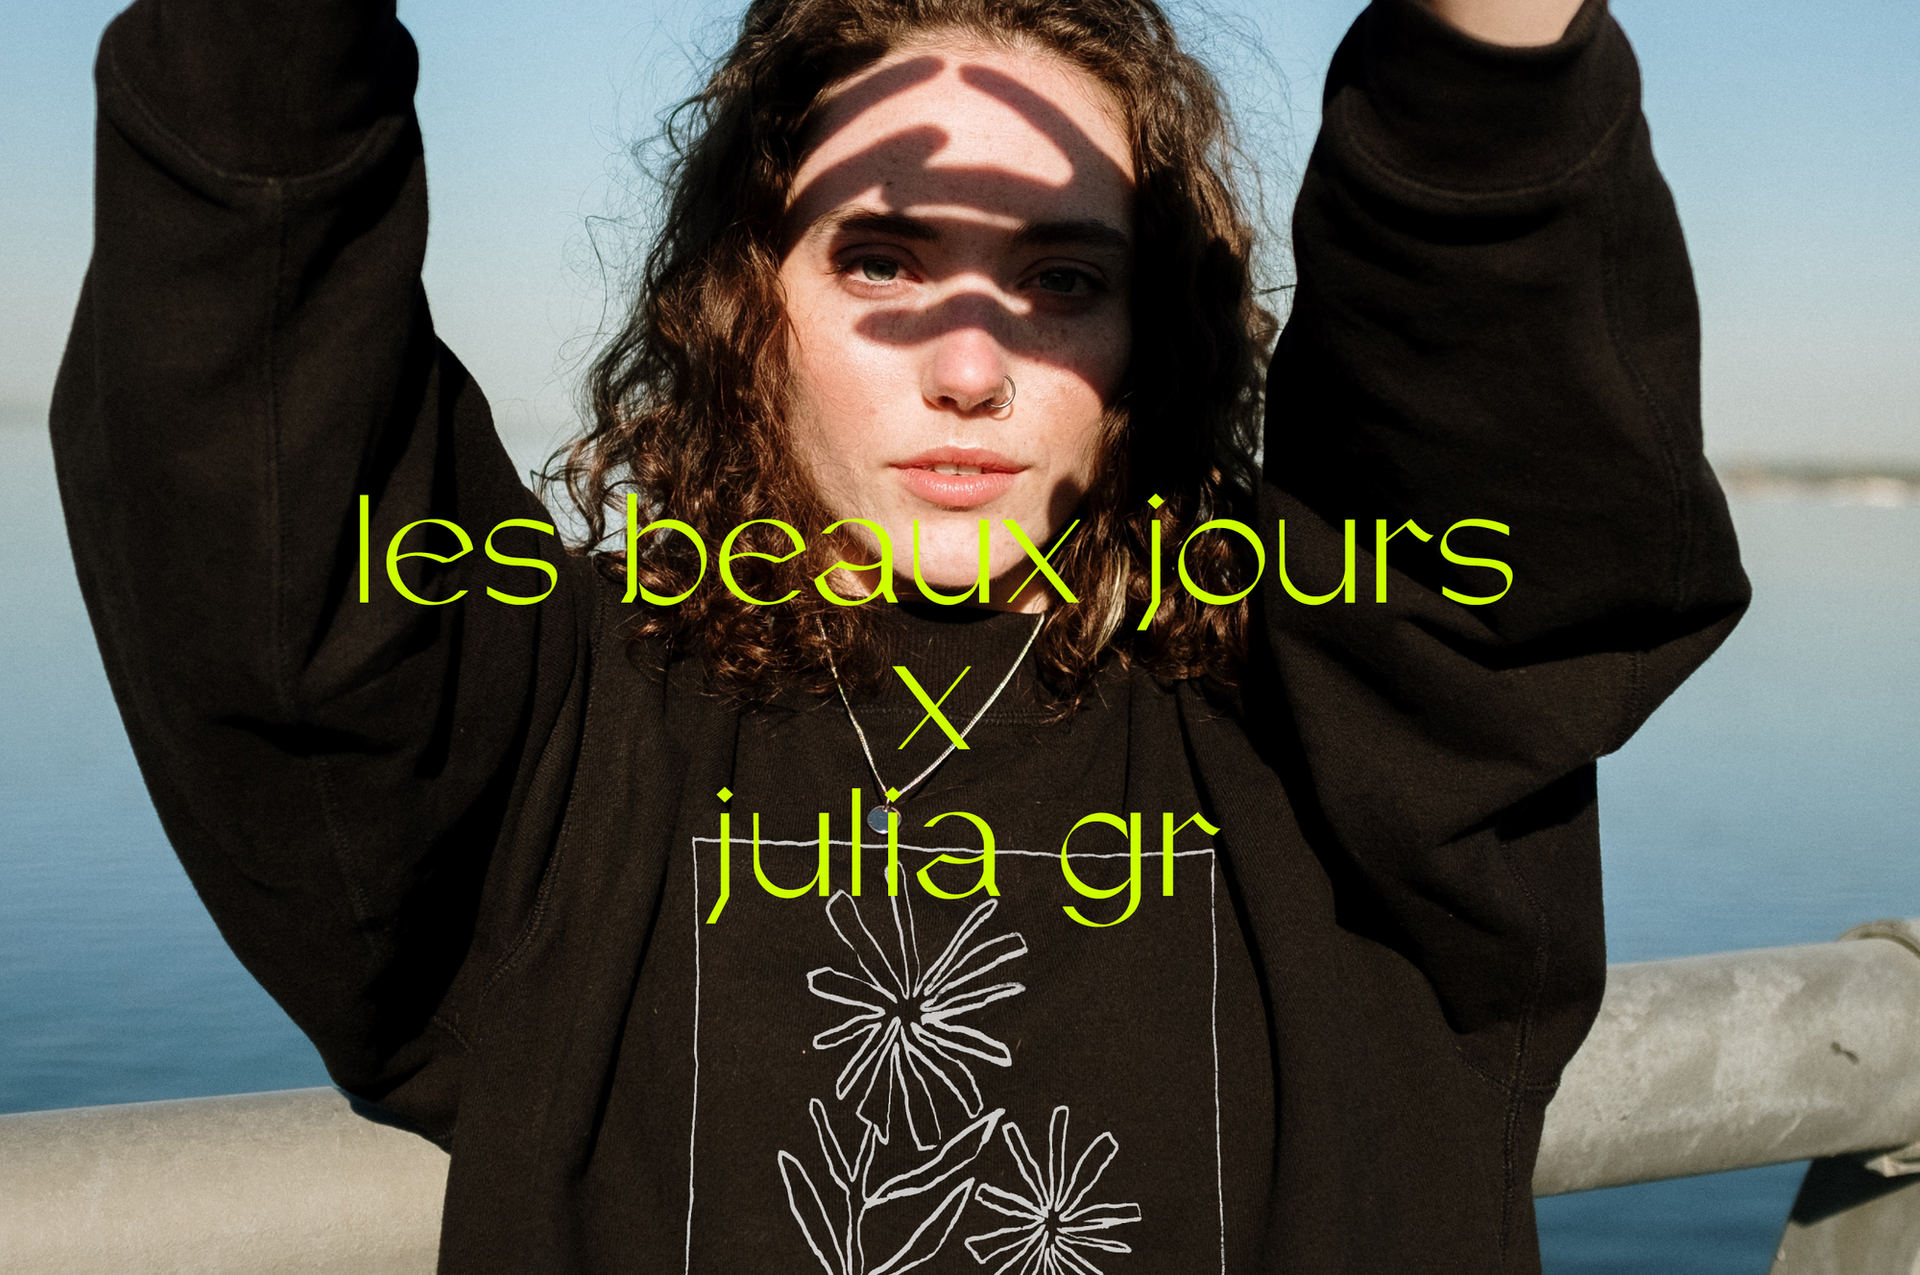 Julia_Choix-21.jpg